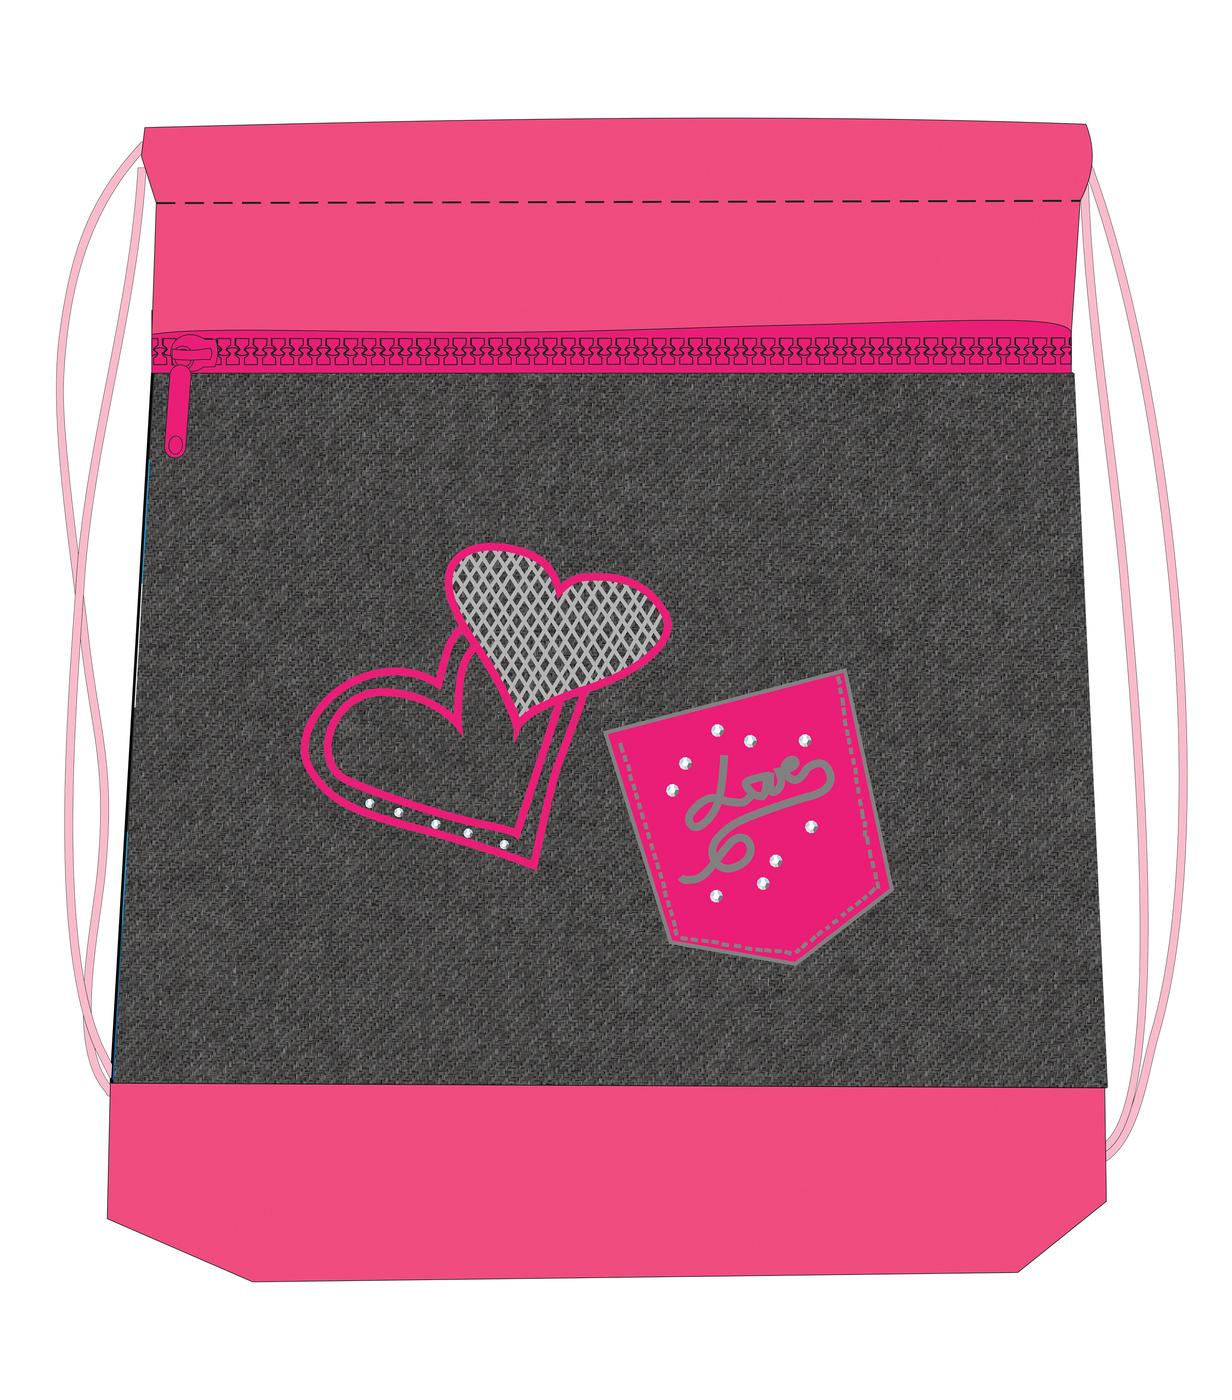 Ранец Belmil 405-35 Missy & Mister Jeans Love + мешок для обуви, - фото 4